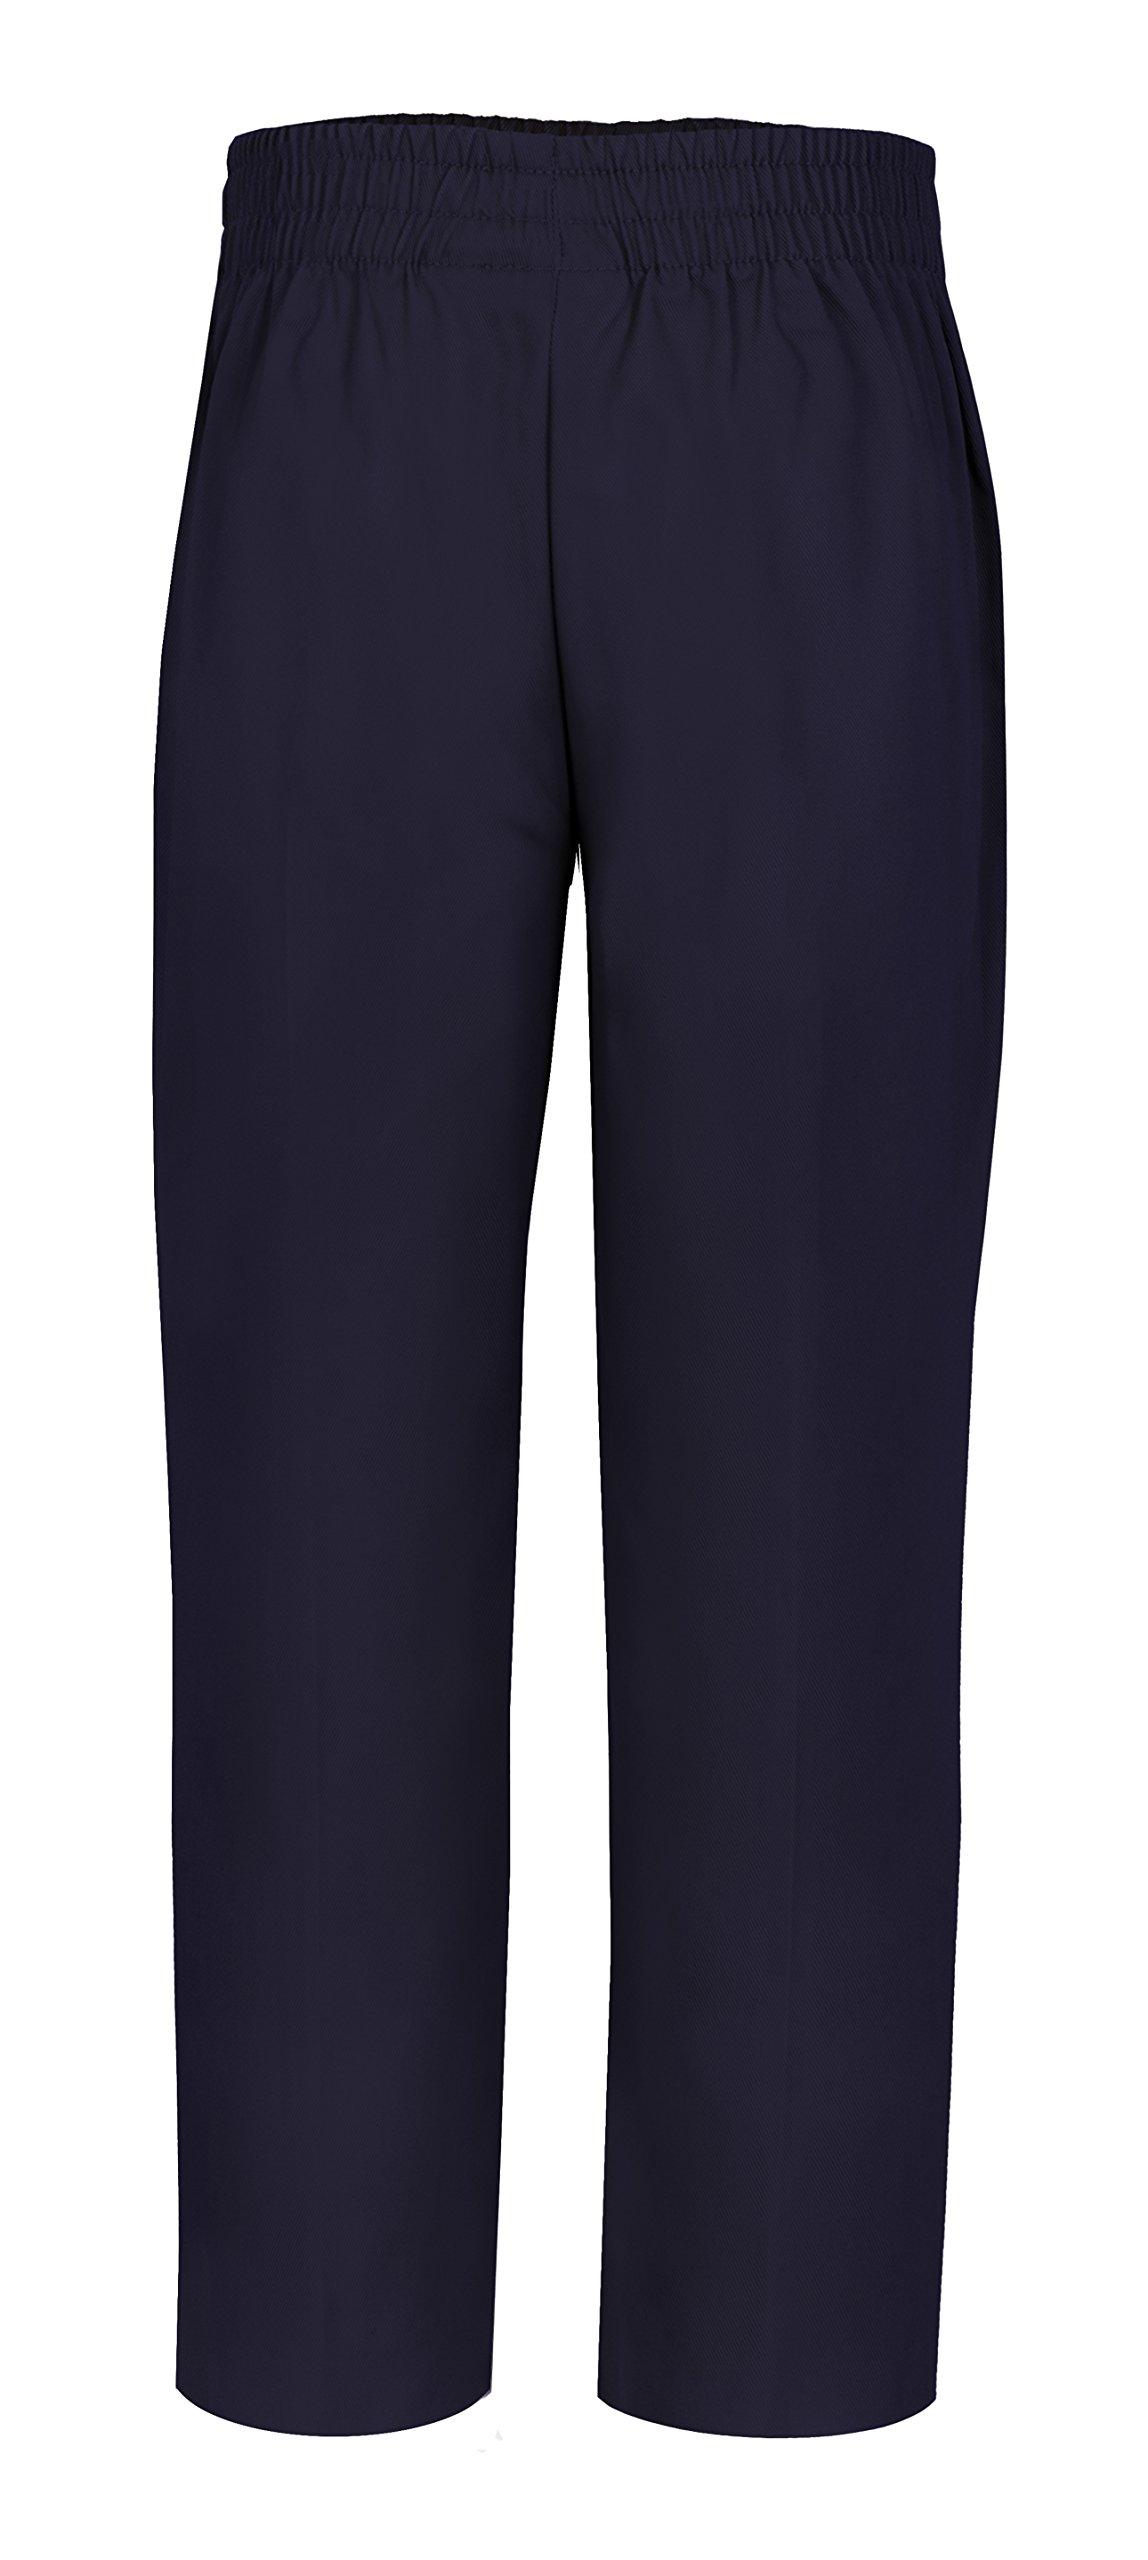 Classroom Uniforms CLASSROOM Big Boys' Uniform Pull-On Pant, Dark Navy, 10